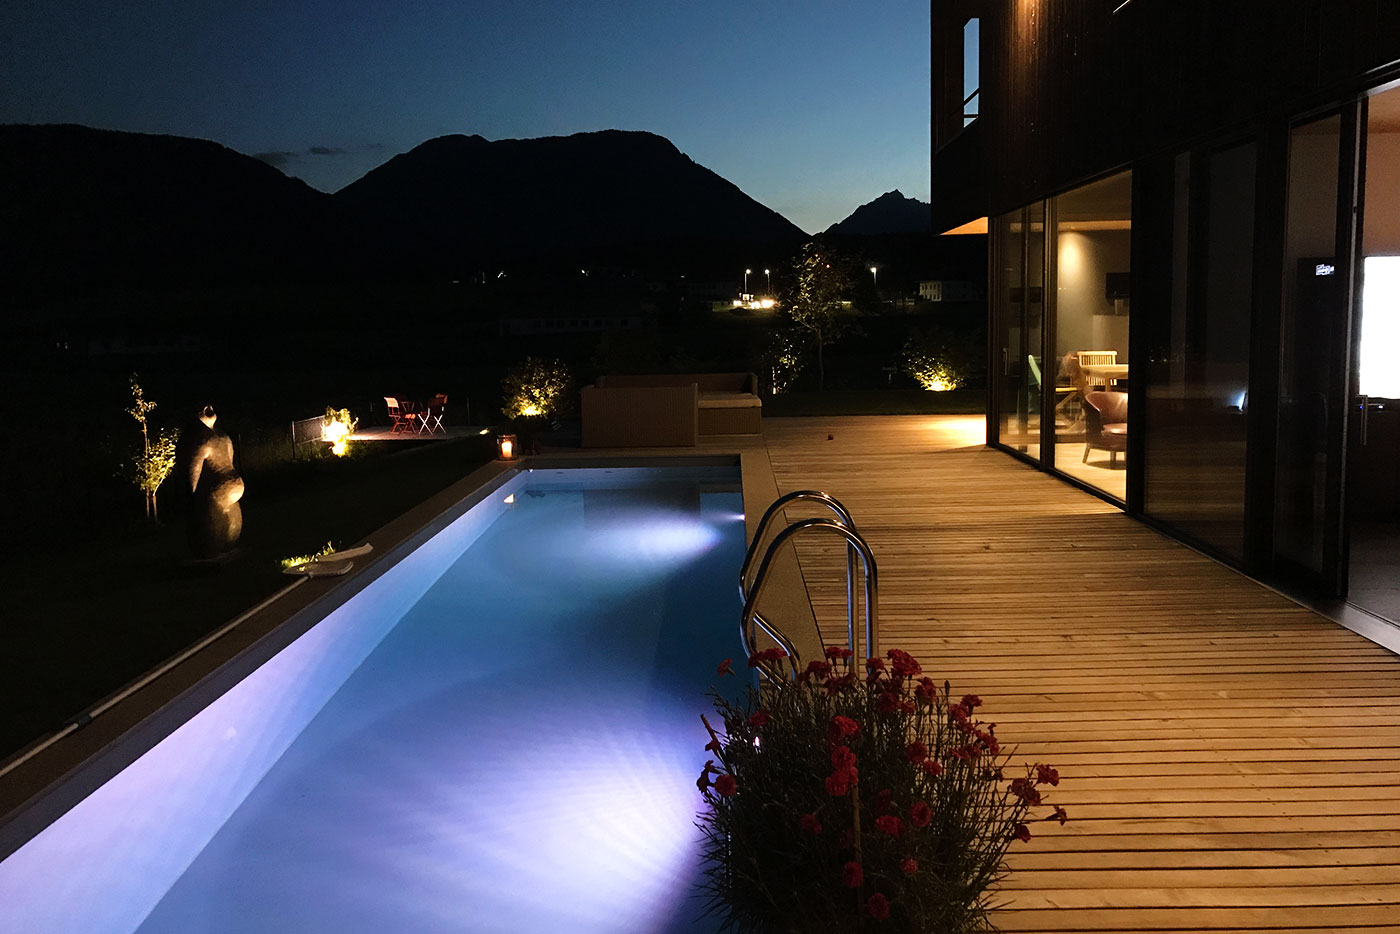 privat-k-niveko-sst-pool-referenz-04-SST-Saurwein-Schwimmbad-Technik